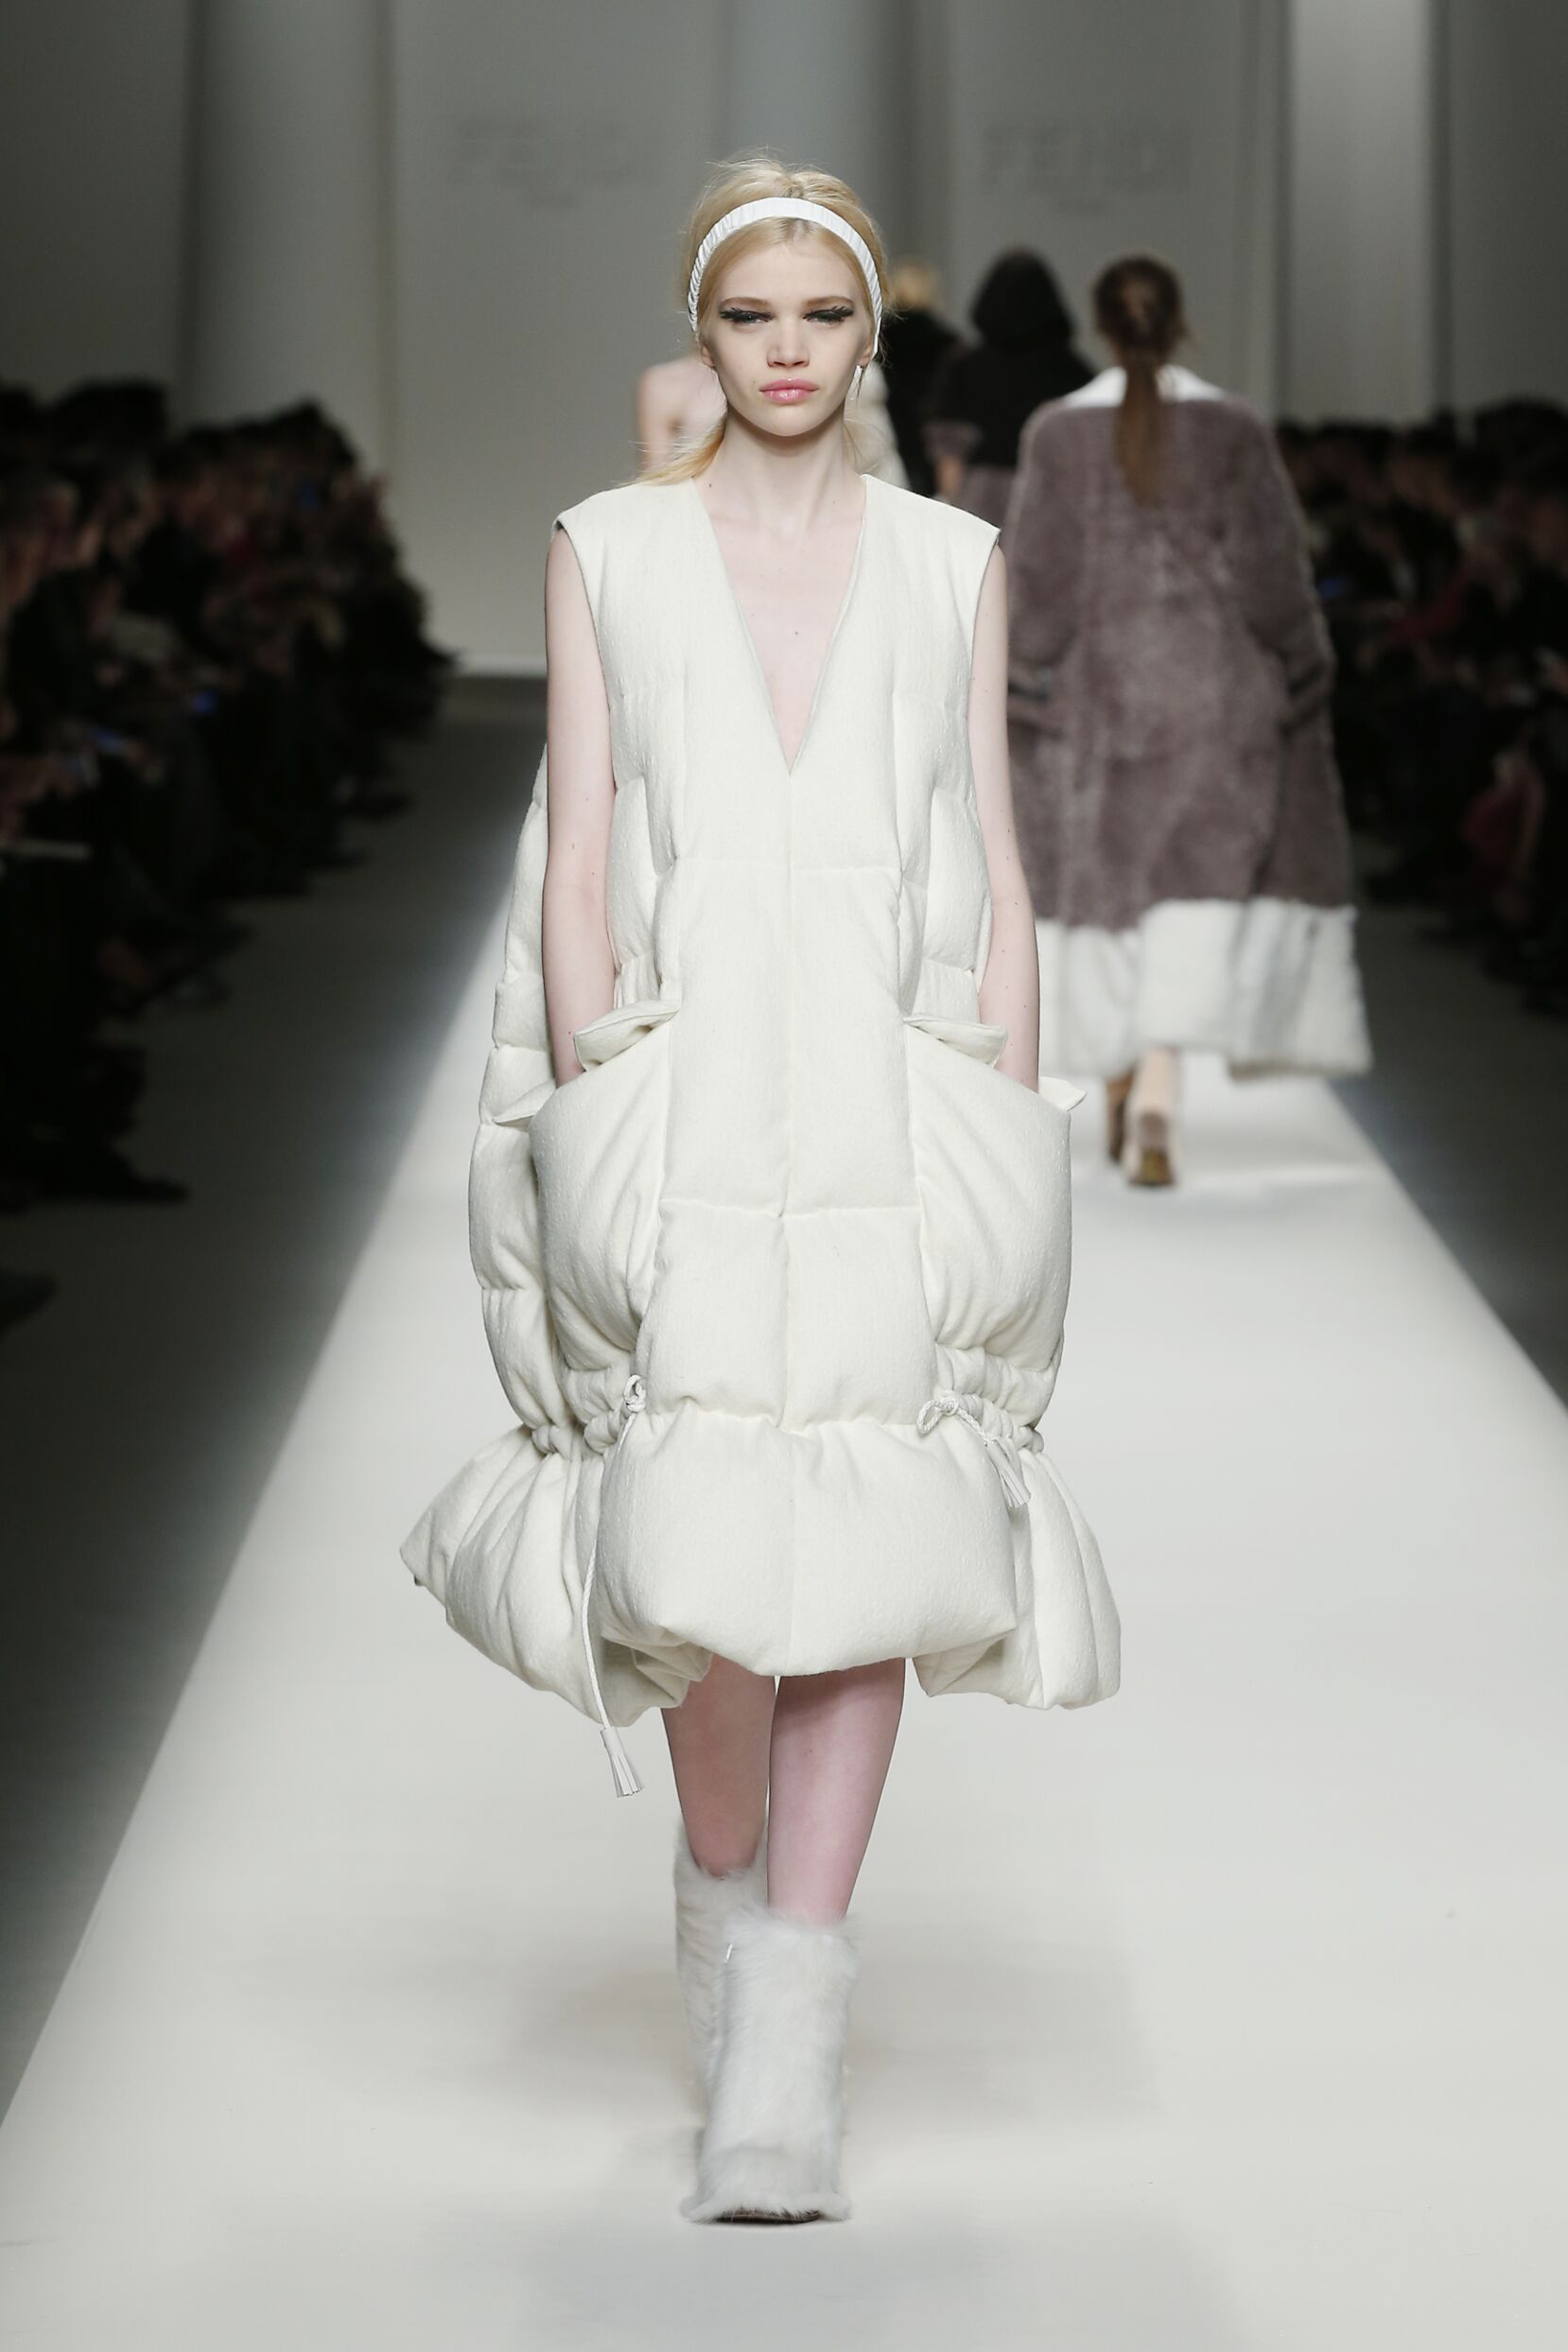 2015 Winter Fashion Show Fendi Collection